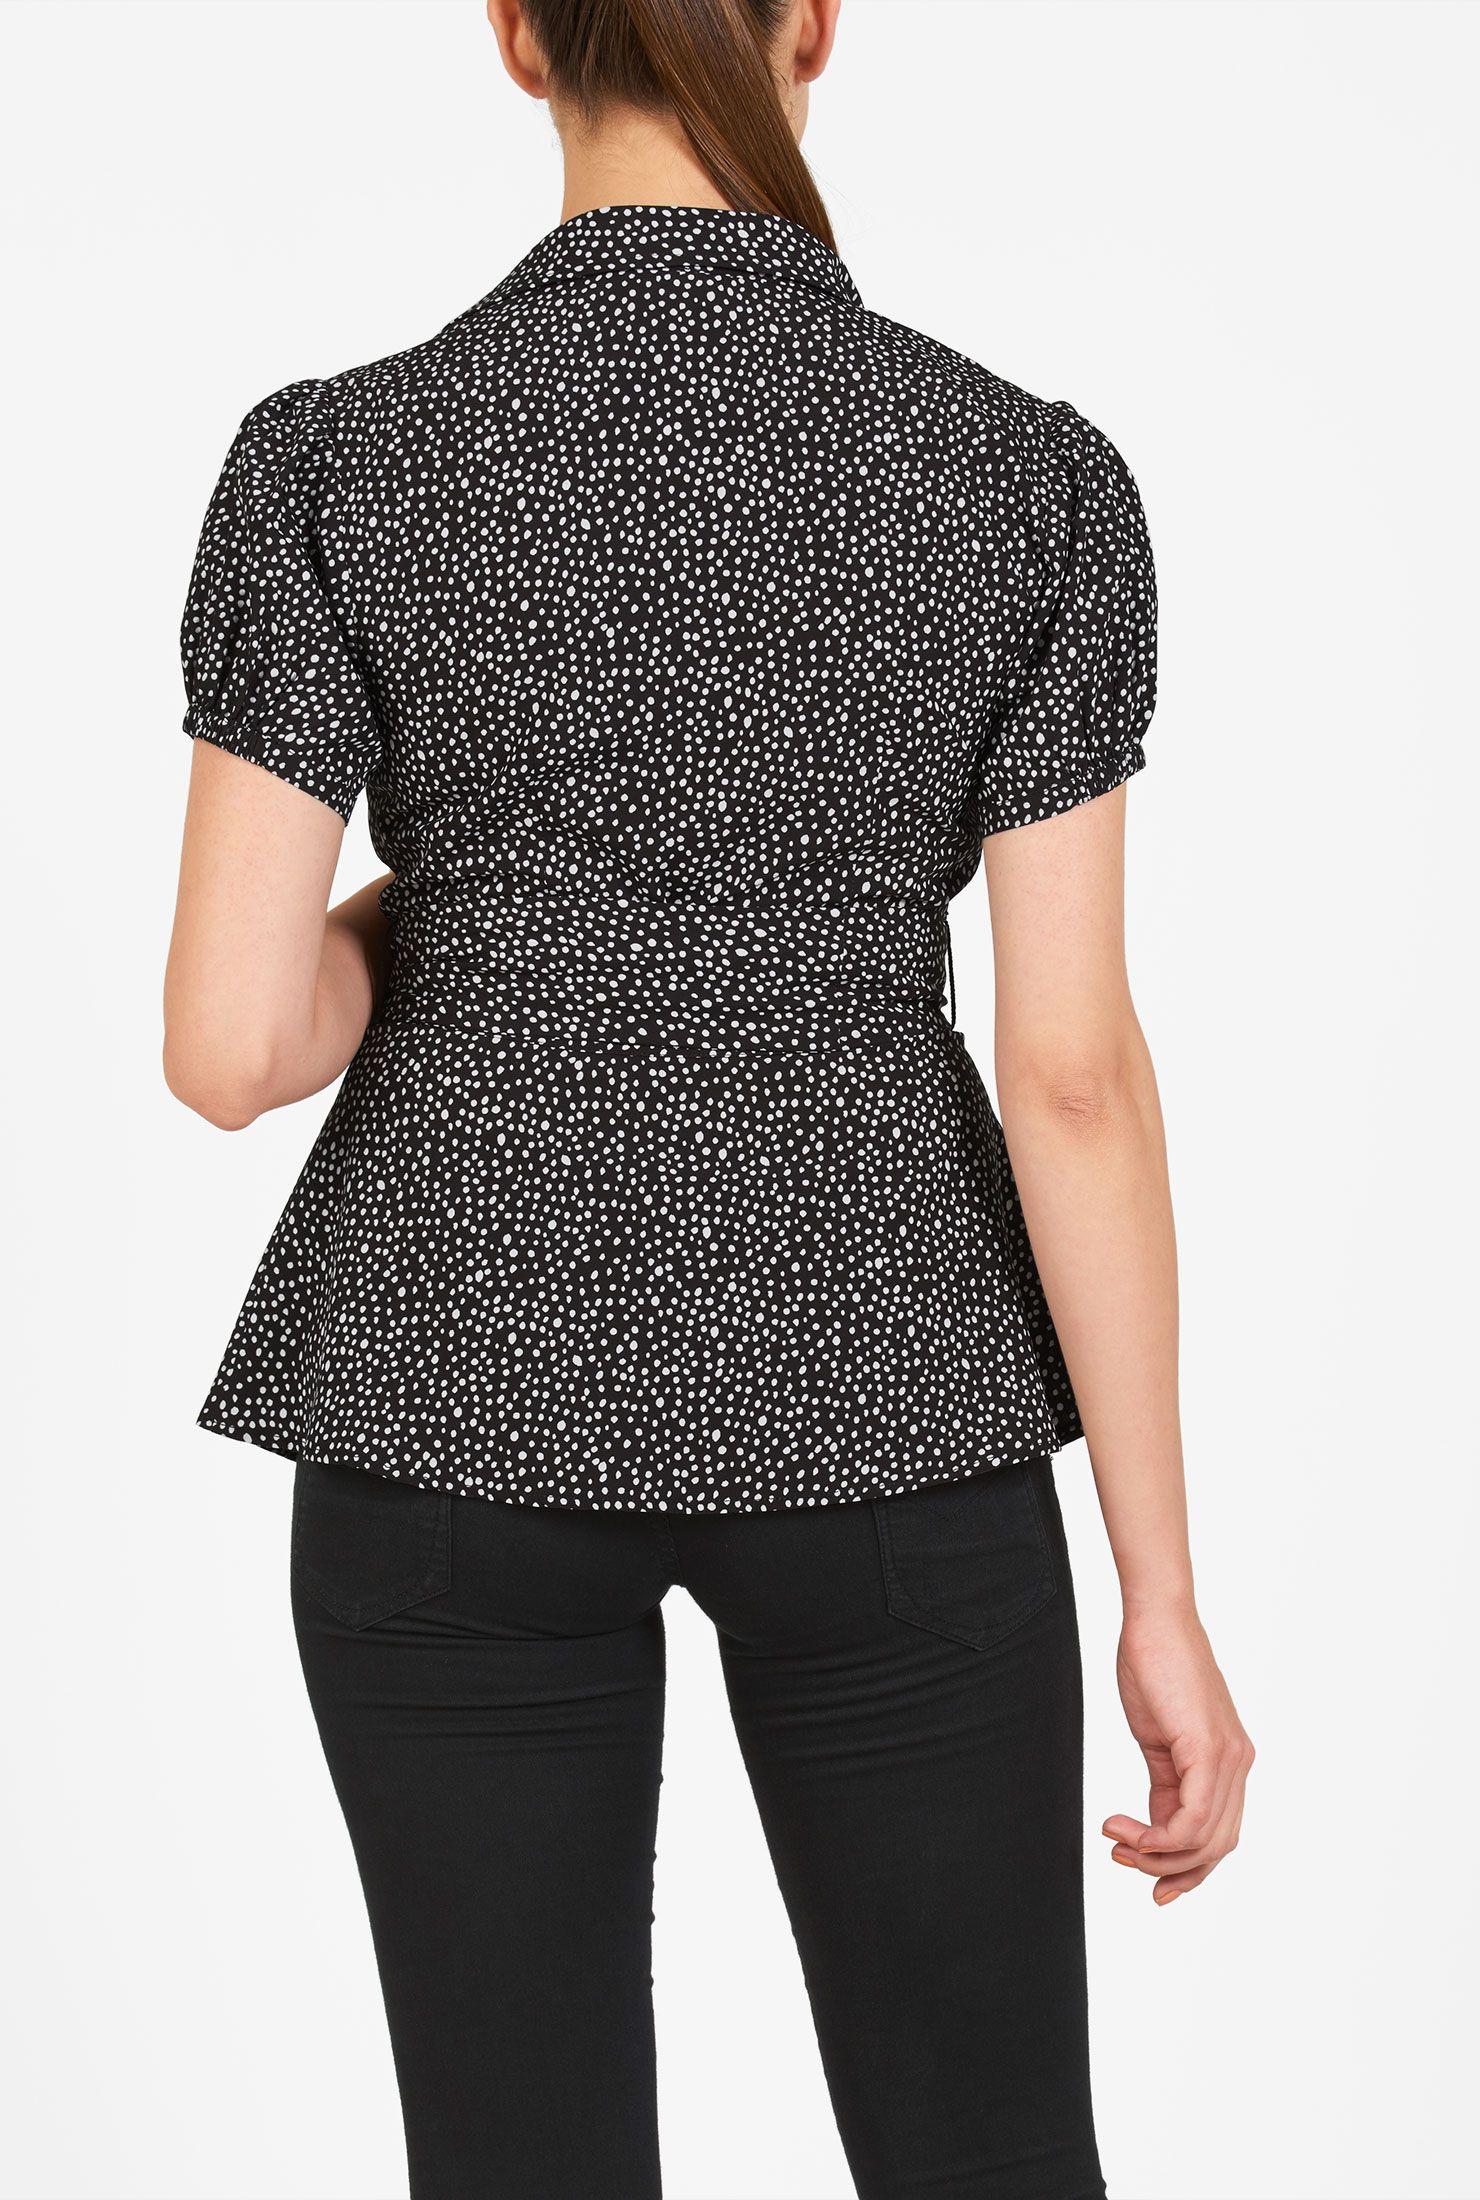 17d4e3b6e6 black and white shirts, digital print tops, Dot Print Tops, hip ...